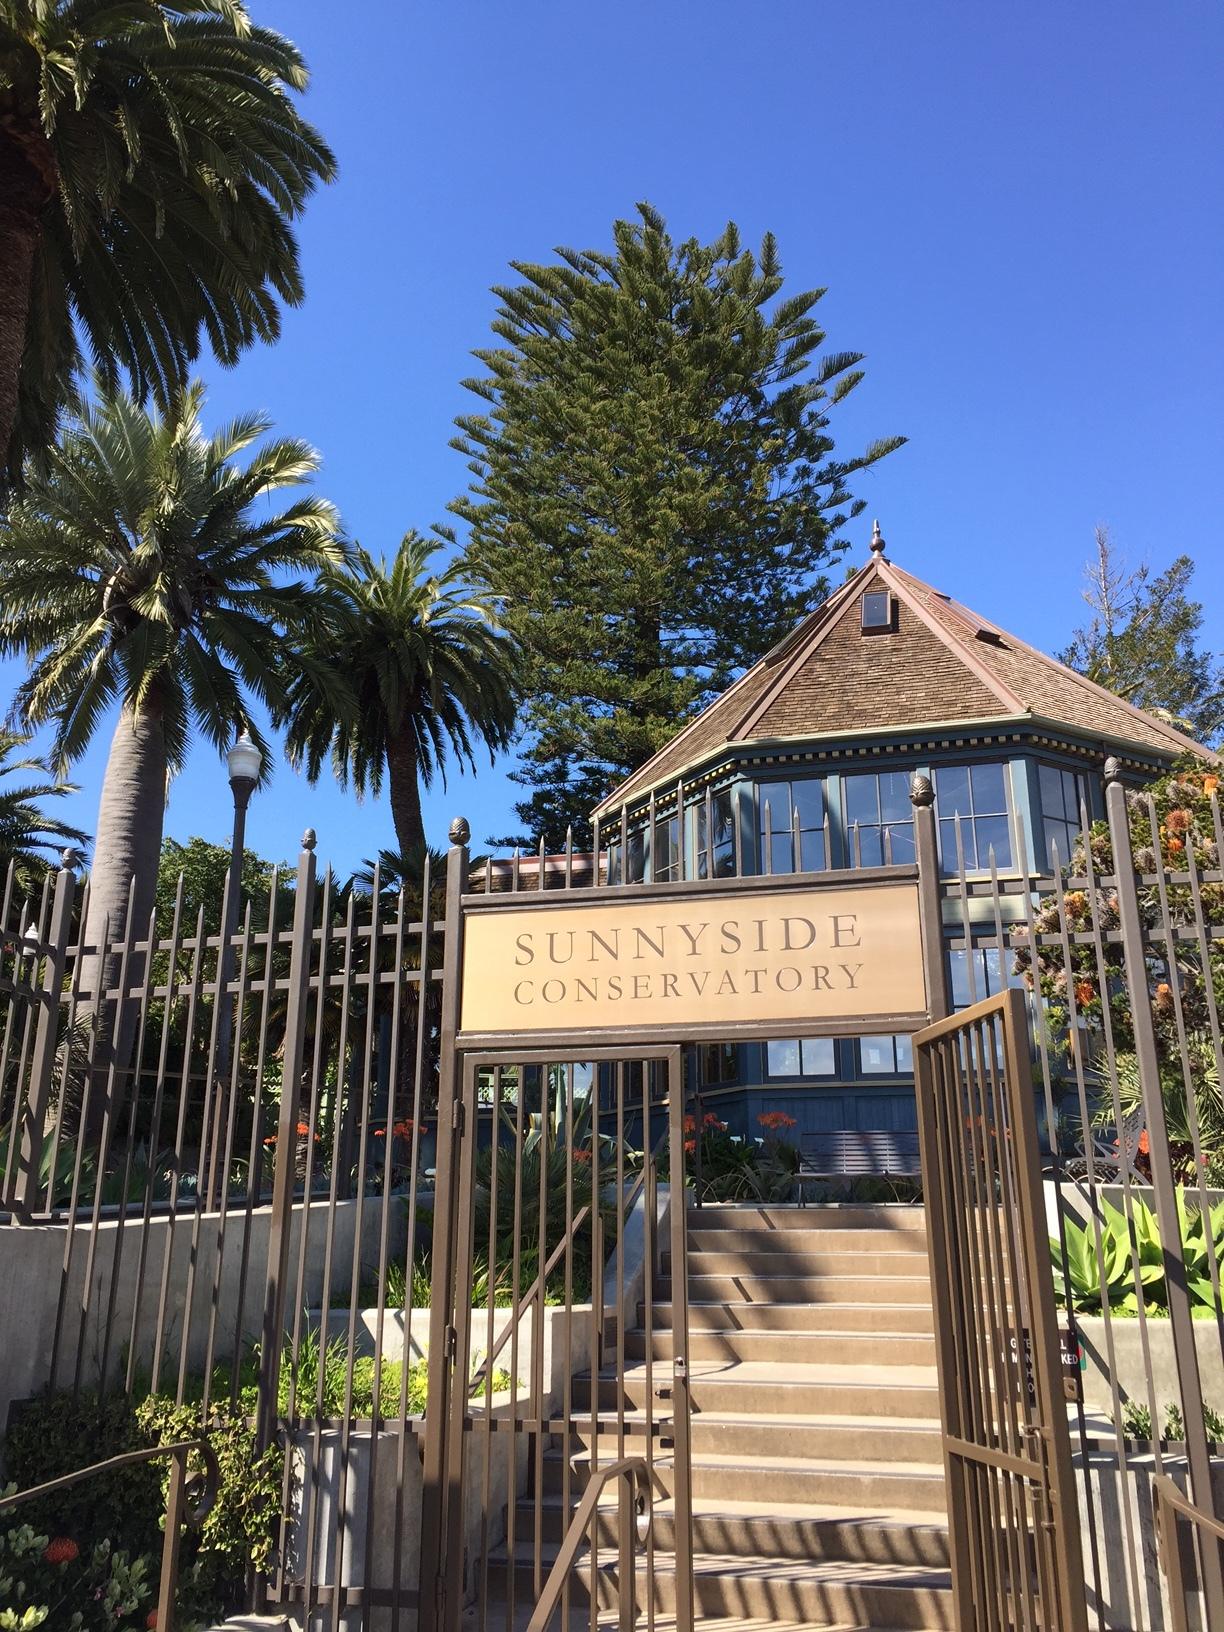 Sunnyside Conservatory.jpg